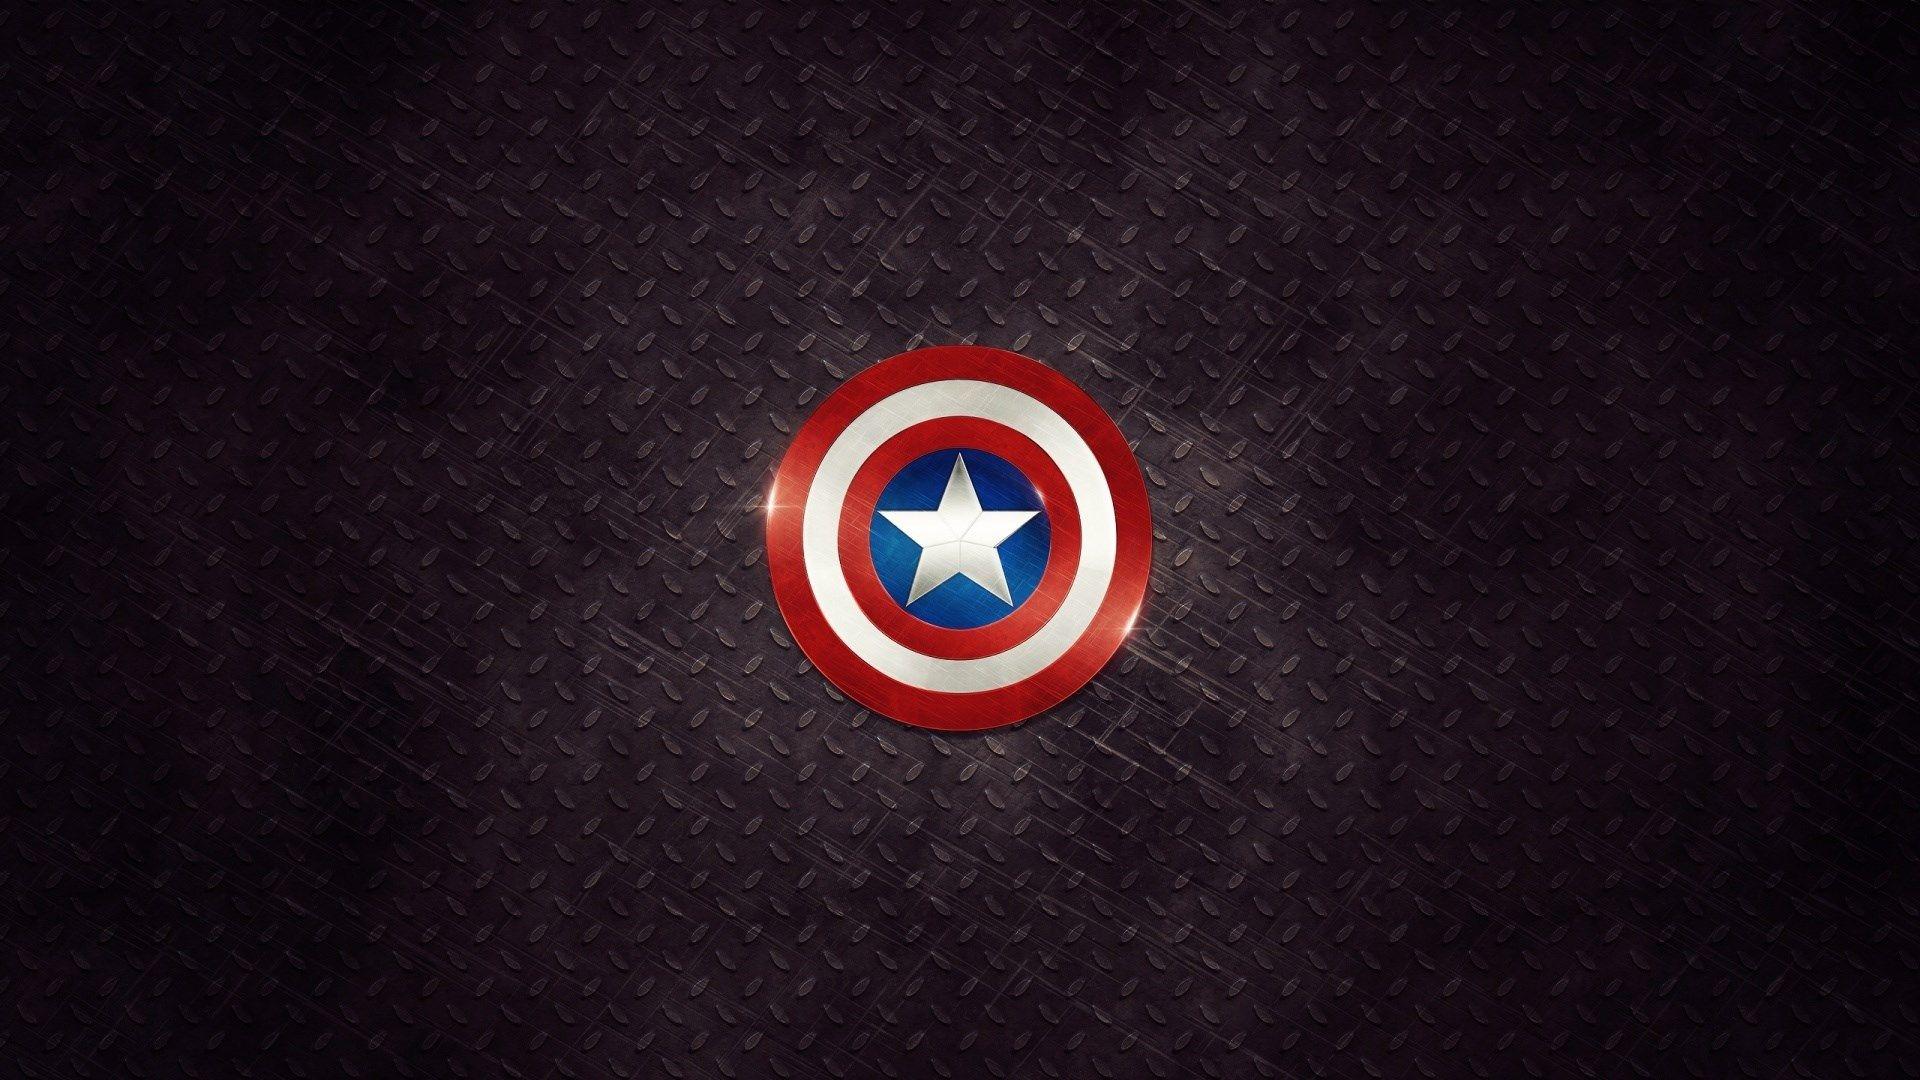 Captain America Free Computer Wallpaper Captain America Art Captain America Shield Wallpaper Captain America Wallpaper